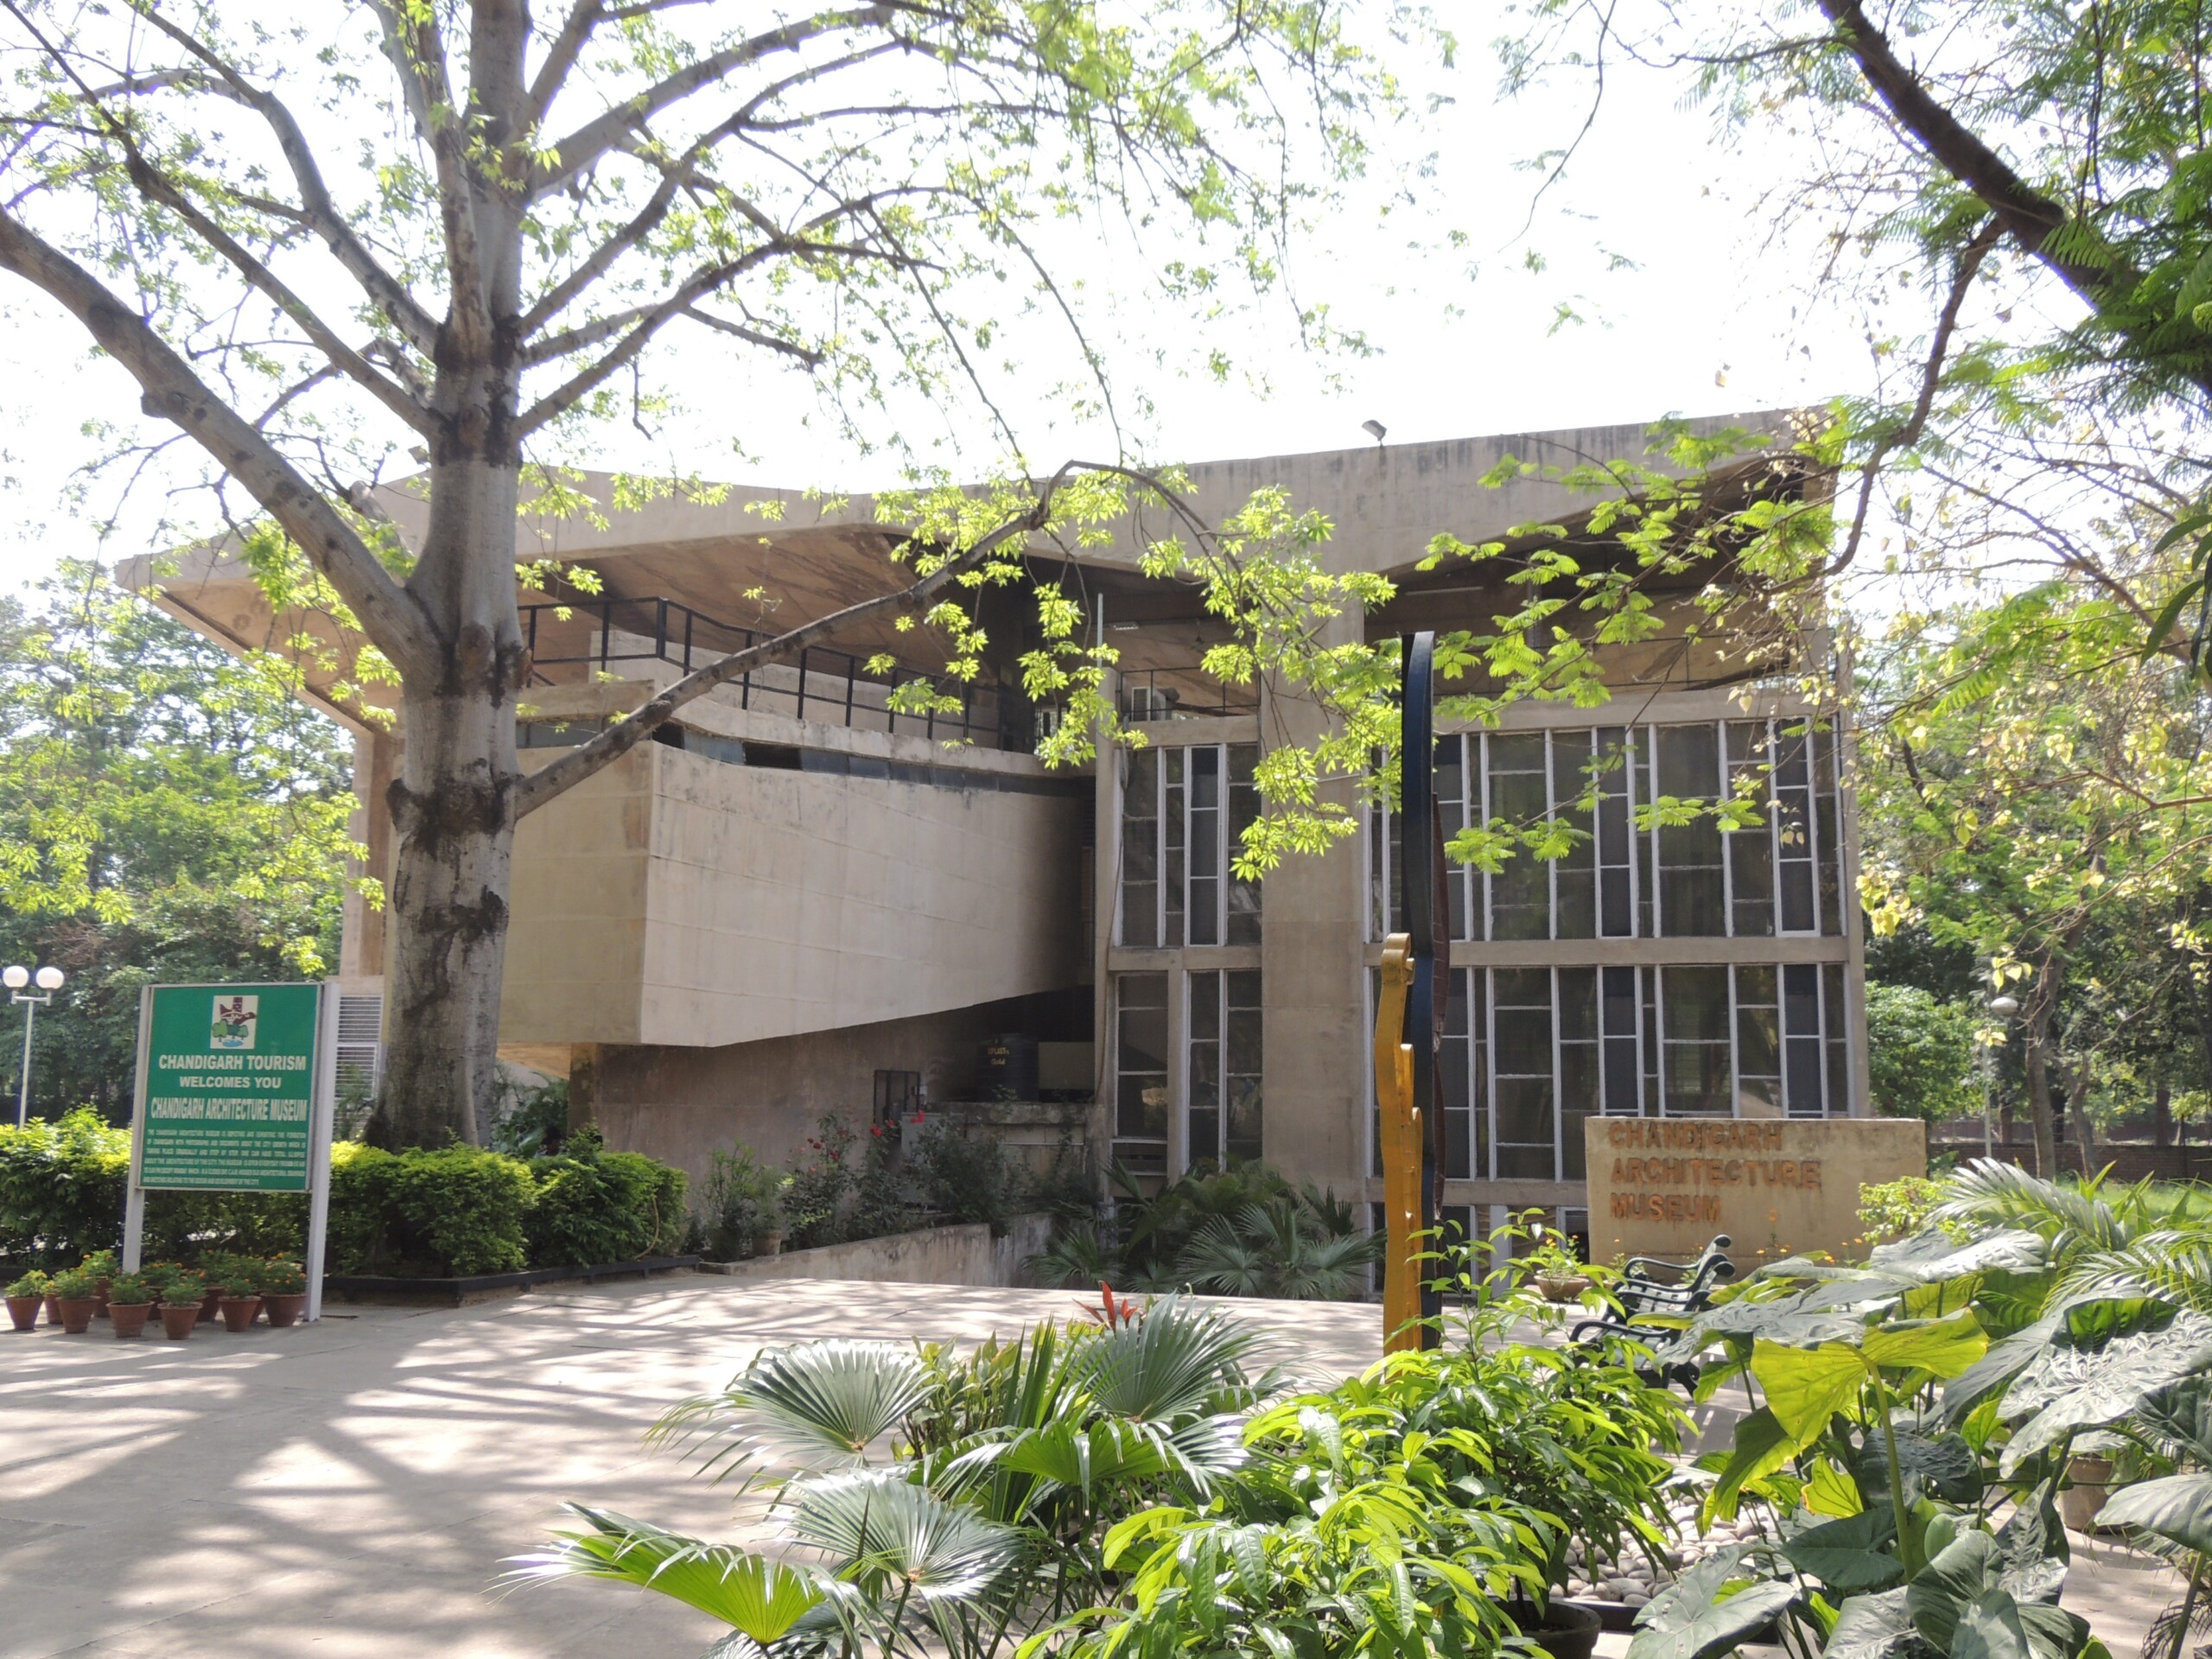 Chandigarh Architectural Museum